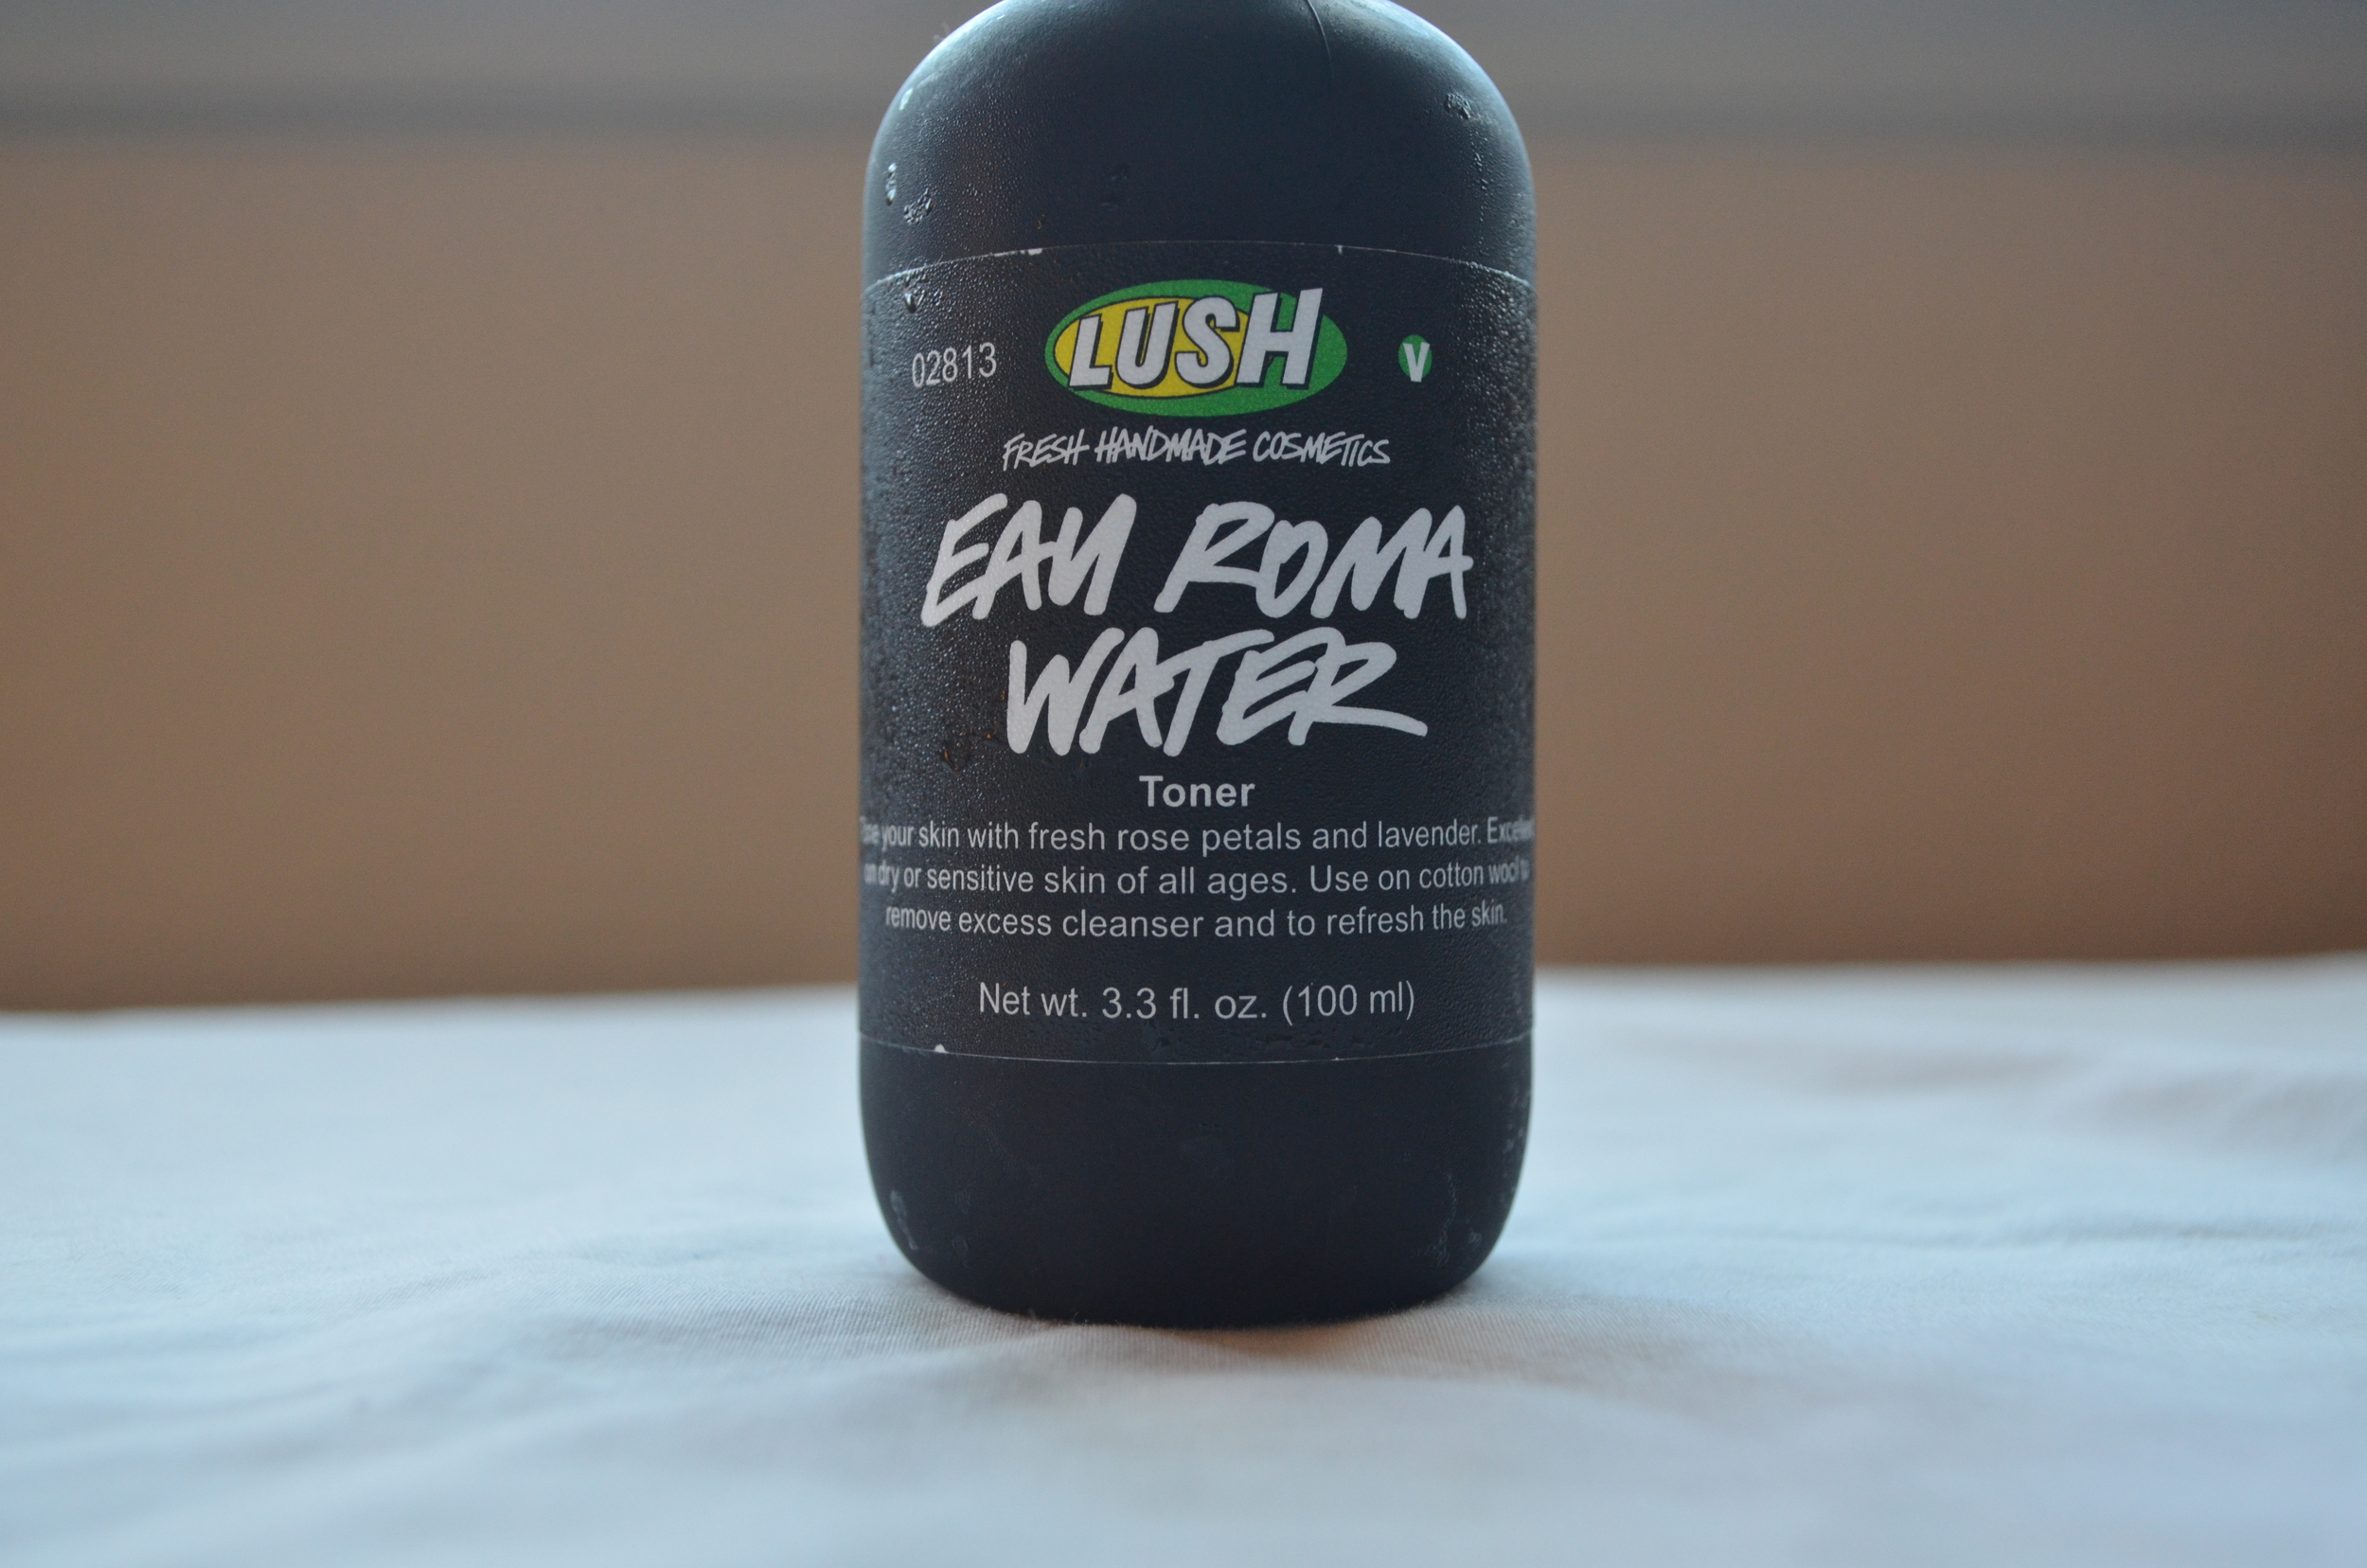 lush eau roma water review